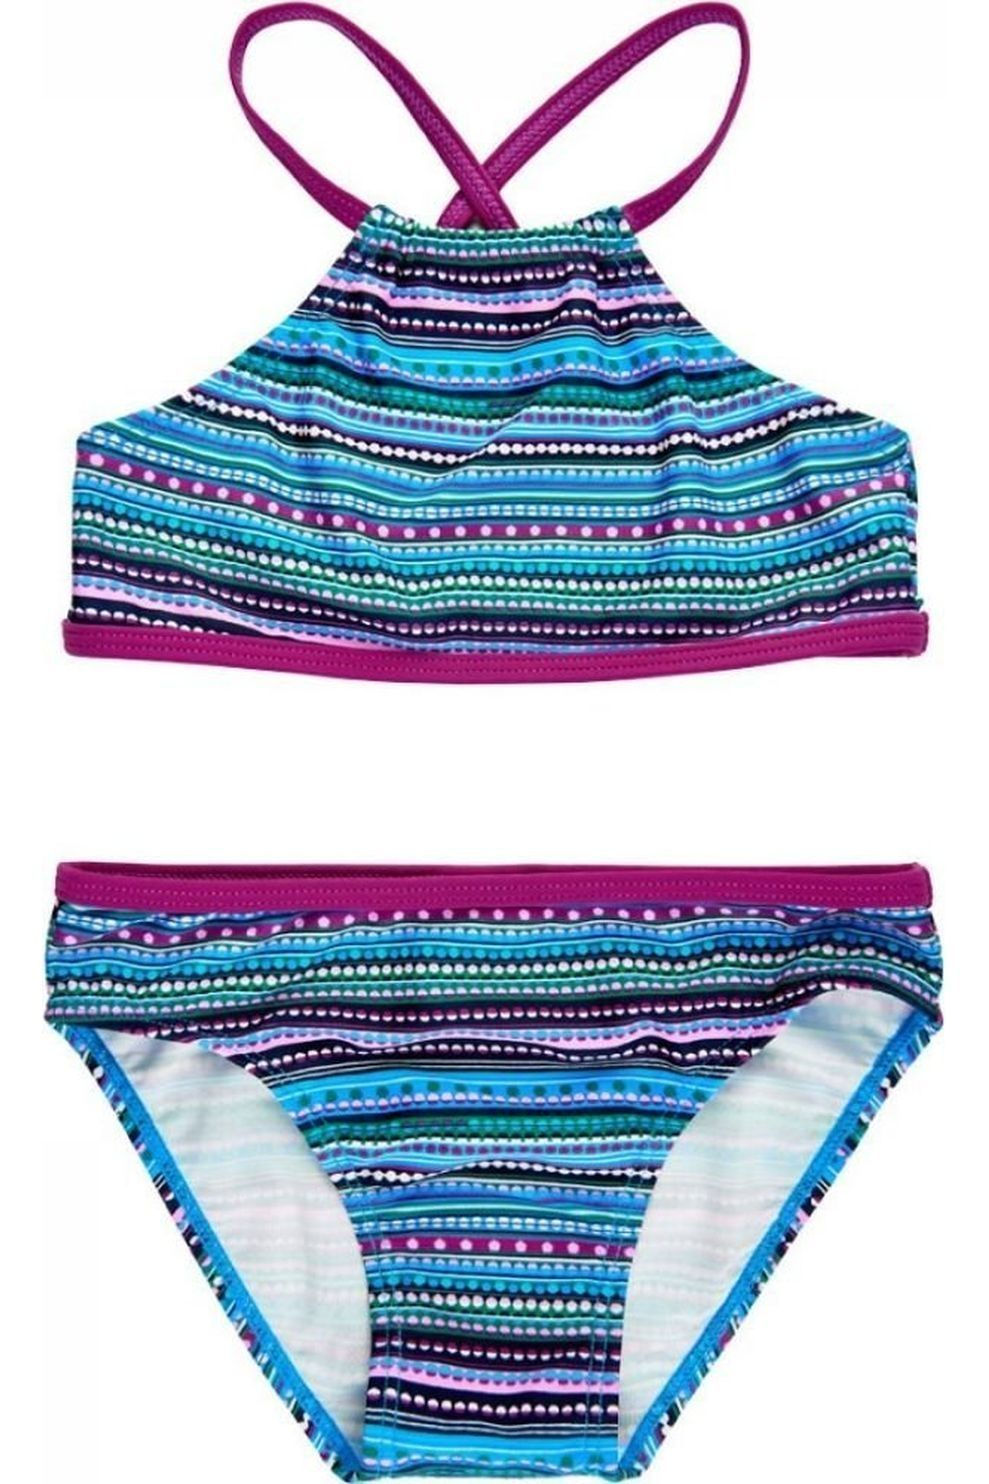 Color Kids Bikini Kate Aop voor meisjes - Blauw/ Gemengd - Maten: 104, 116, 128, 140